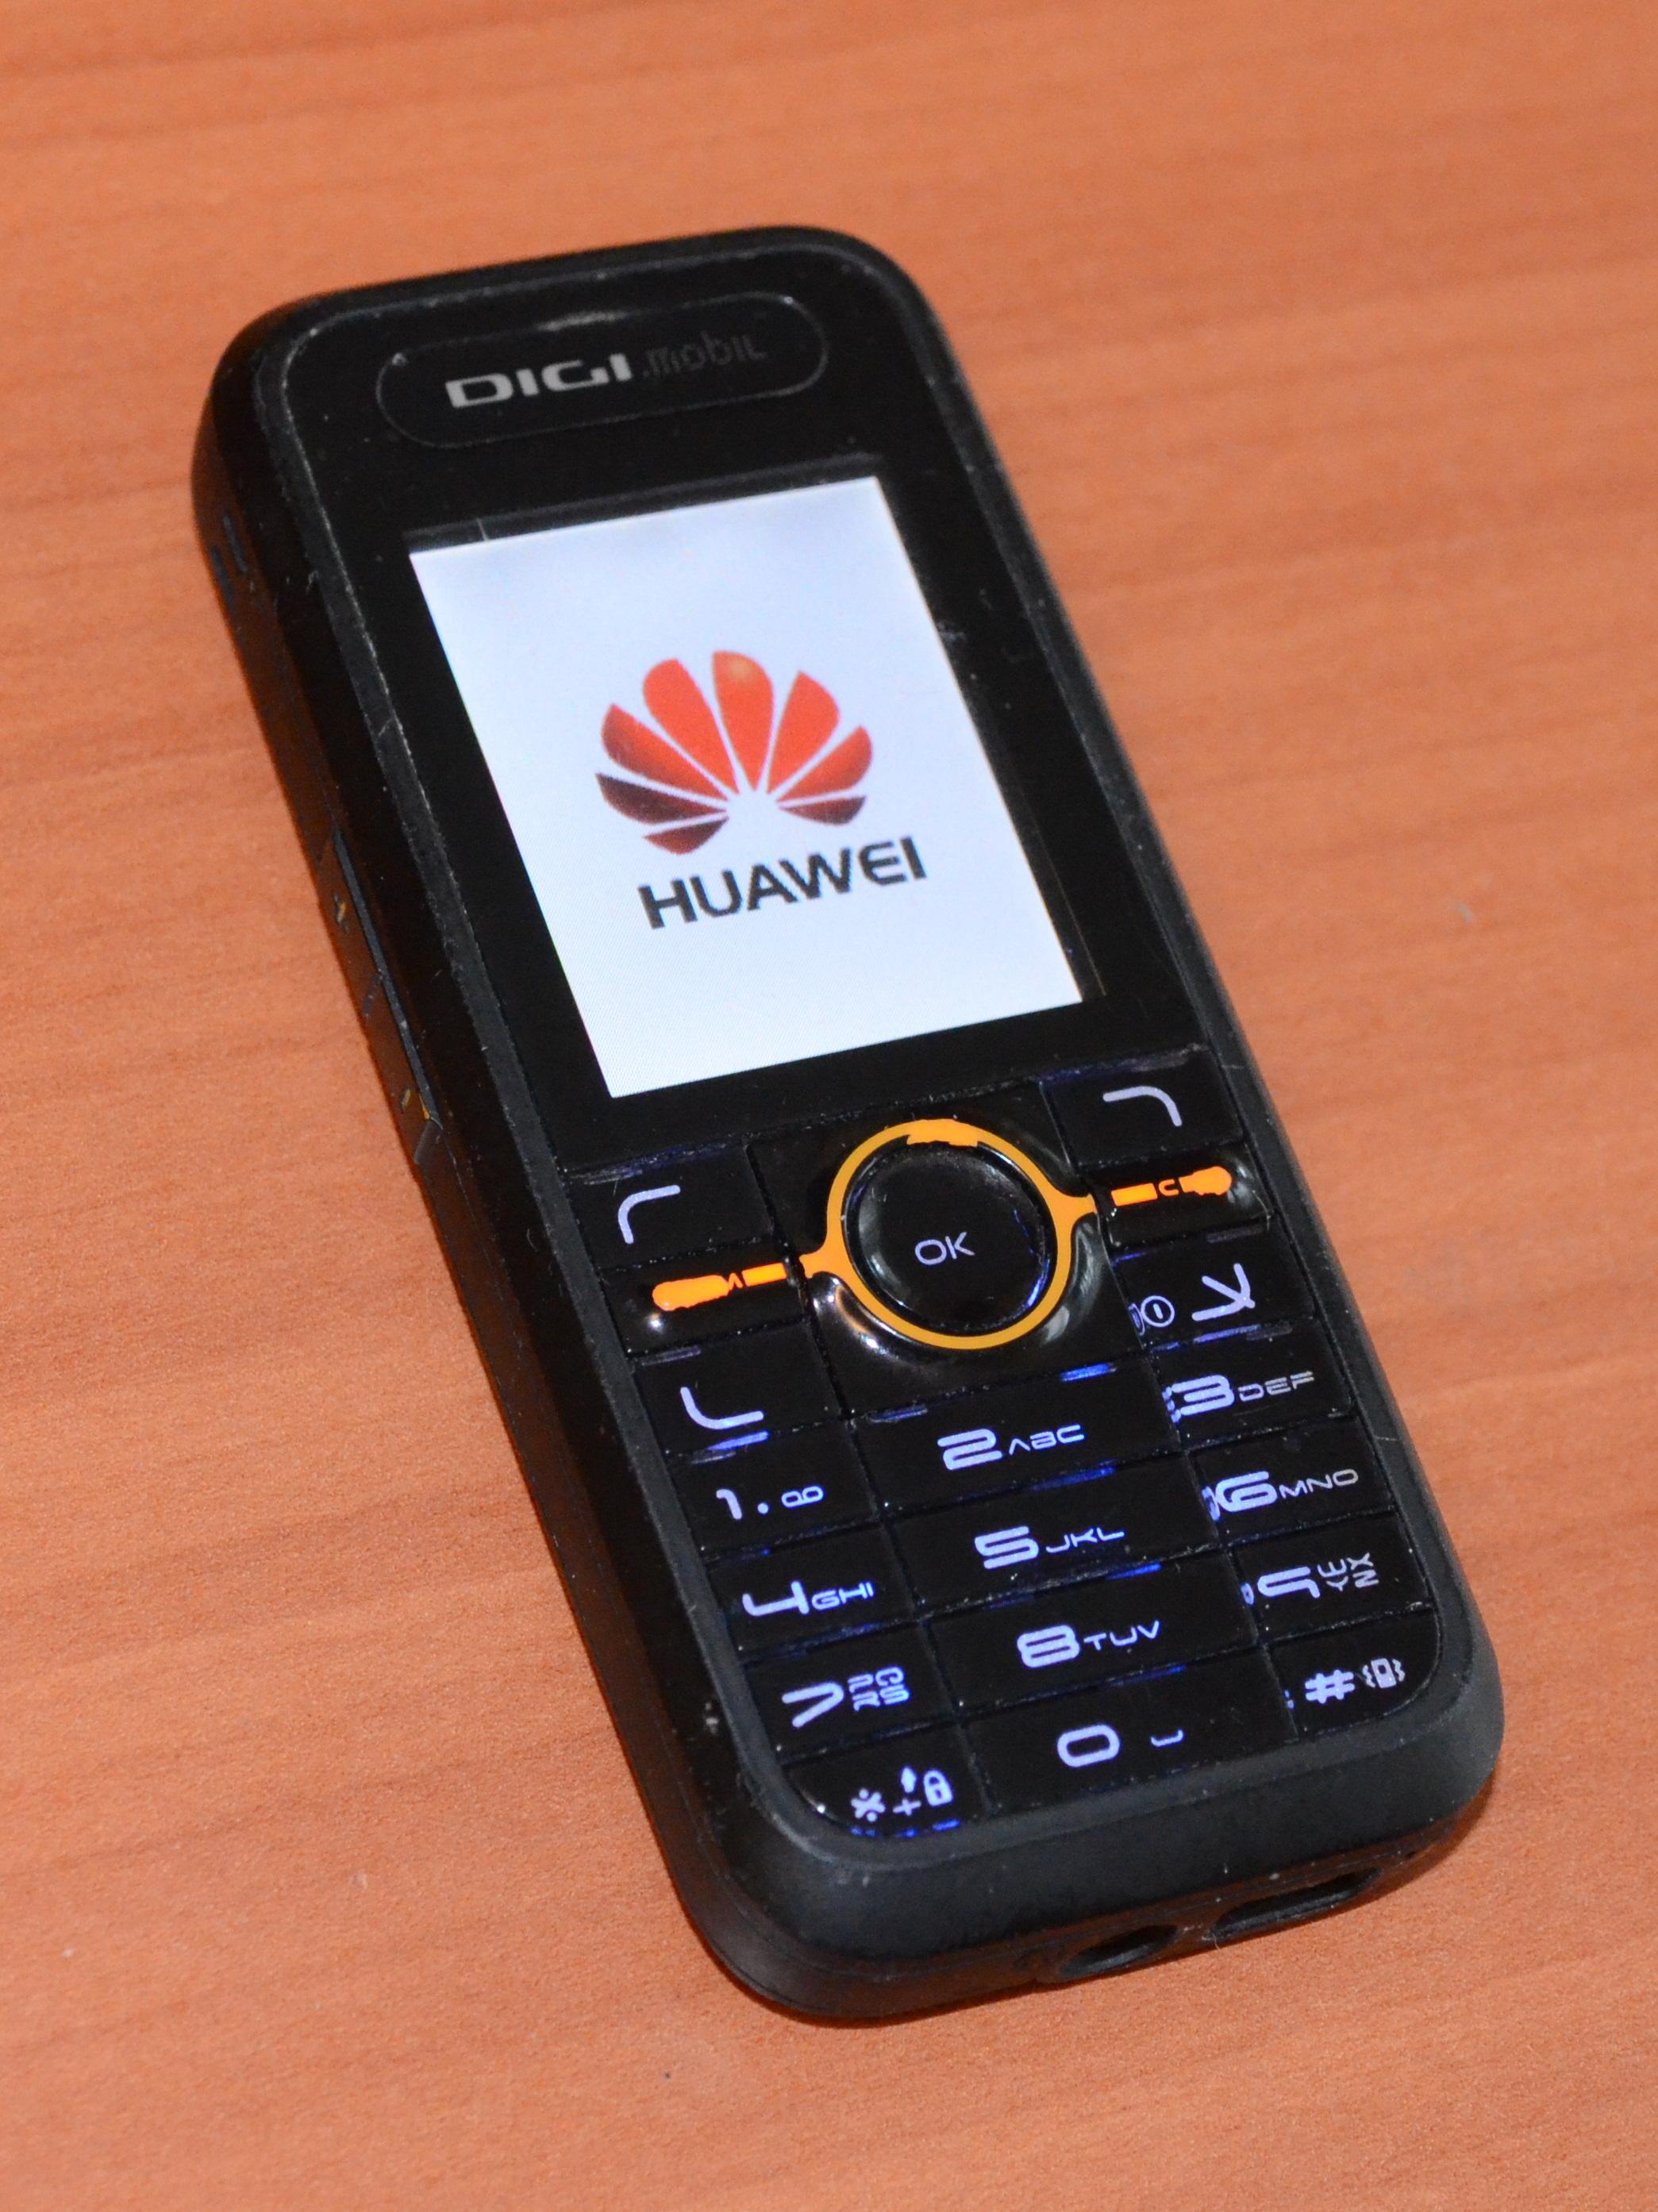 File huawei u1220s digi mobil jpg wikimedia commons for Mobil wikipedia